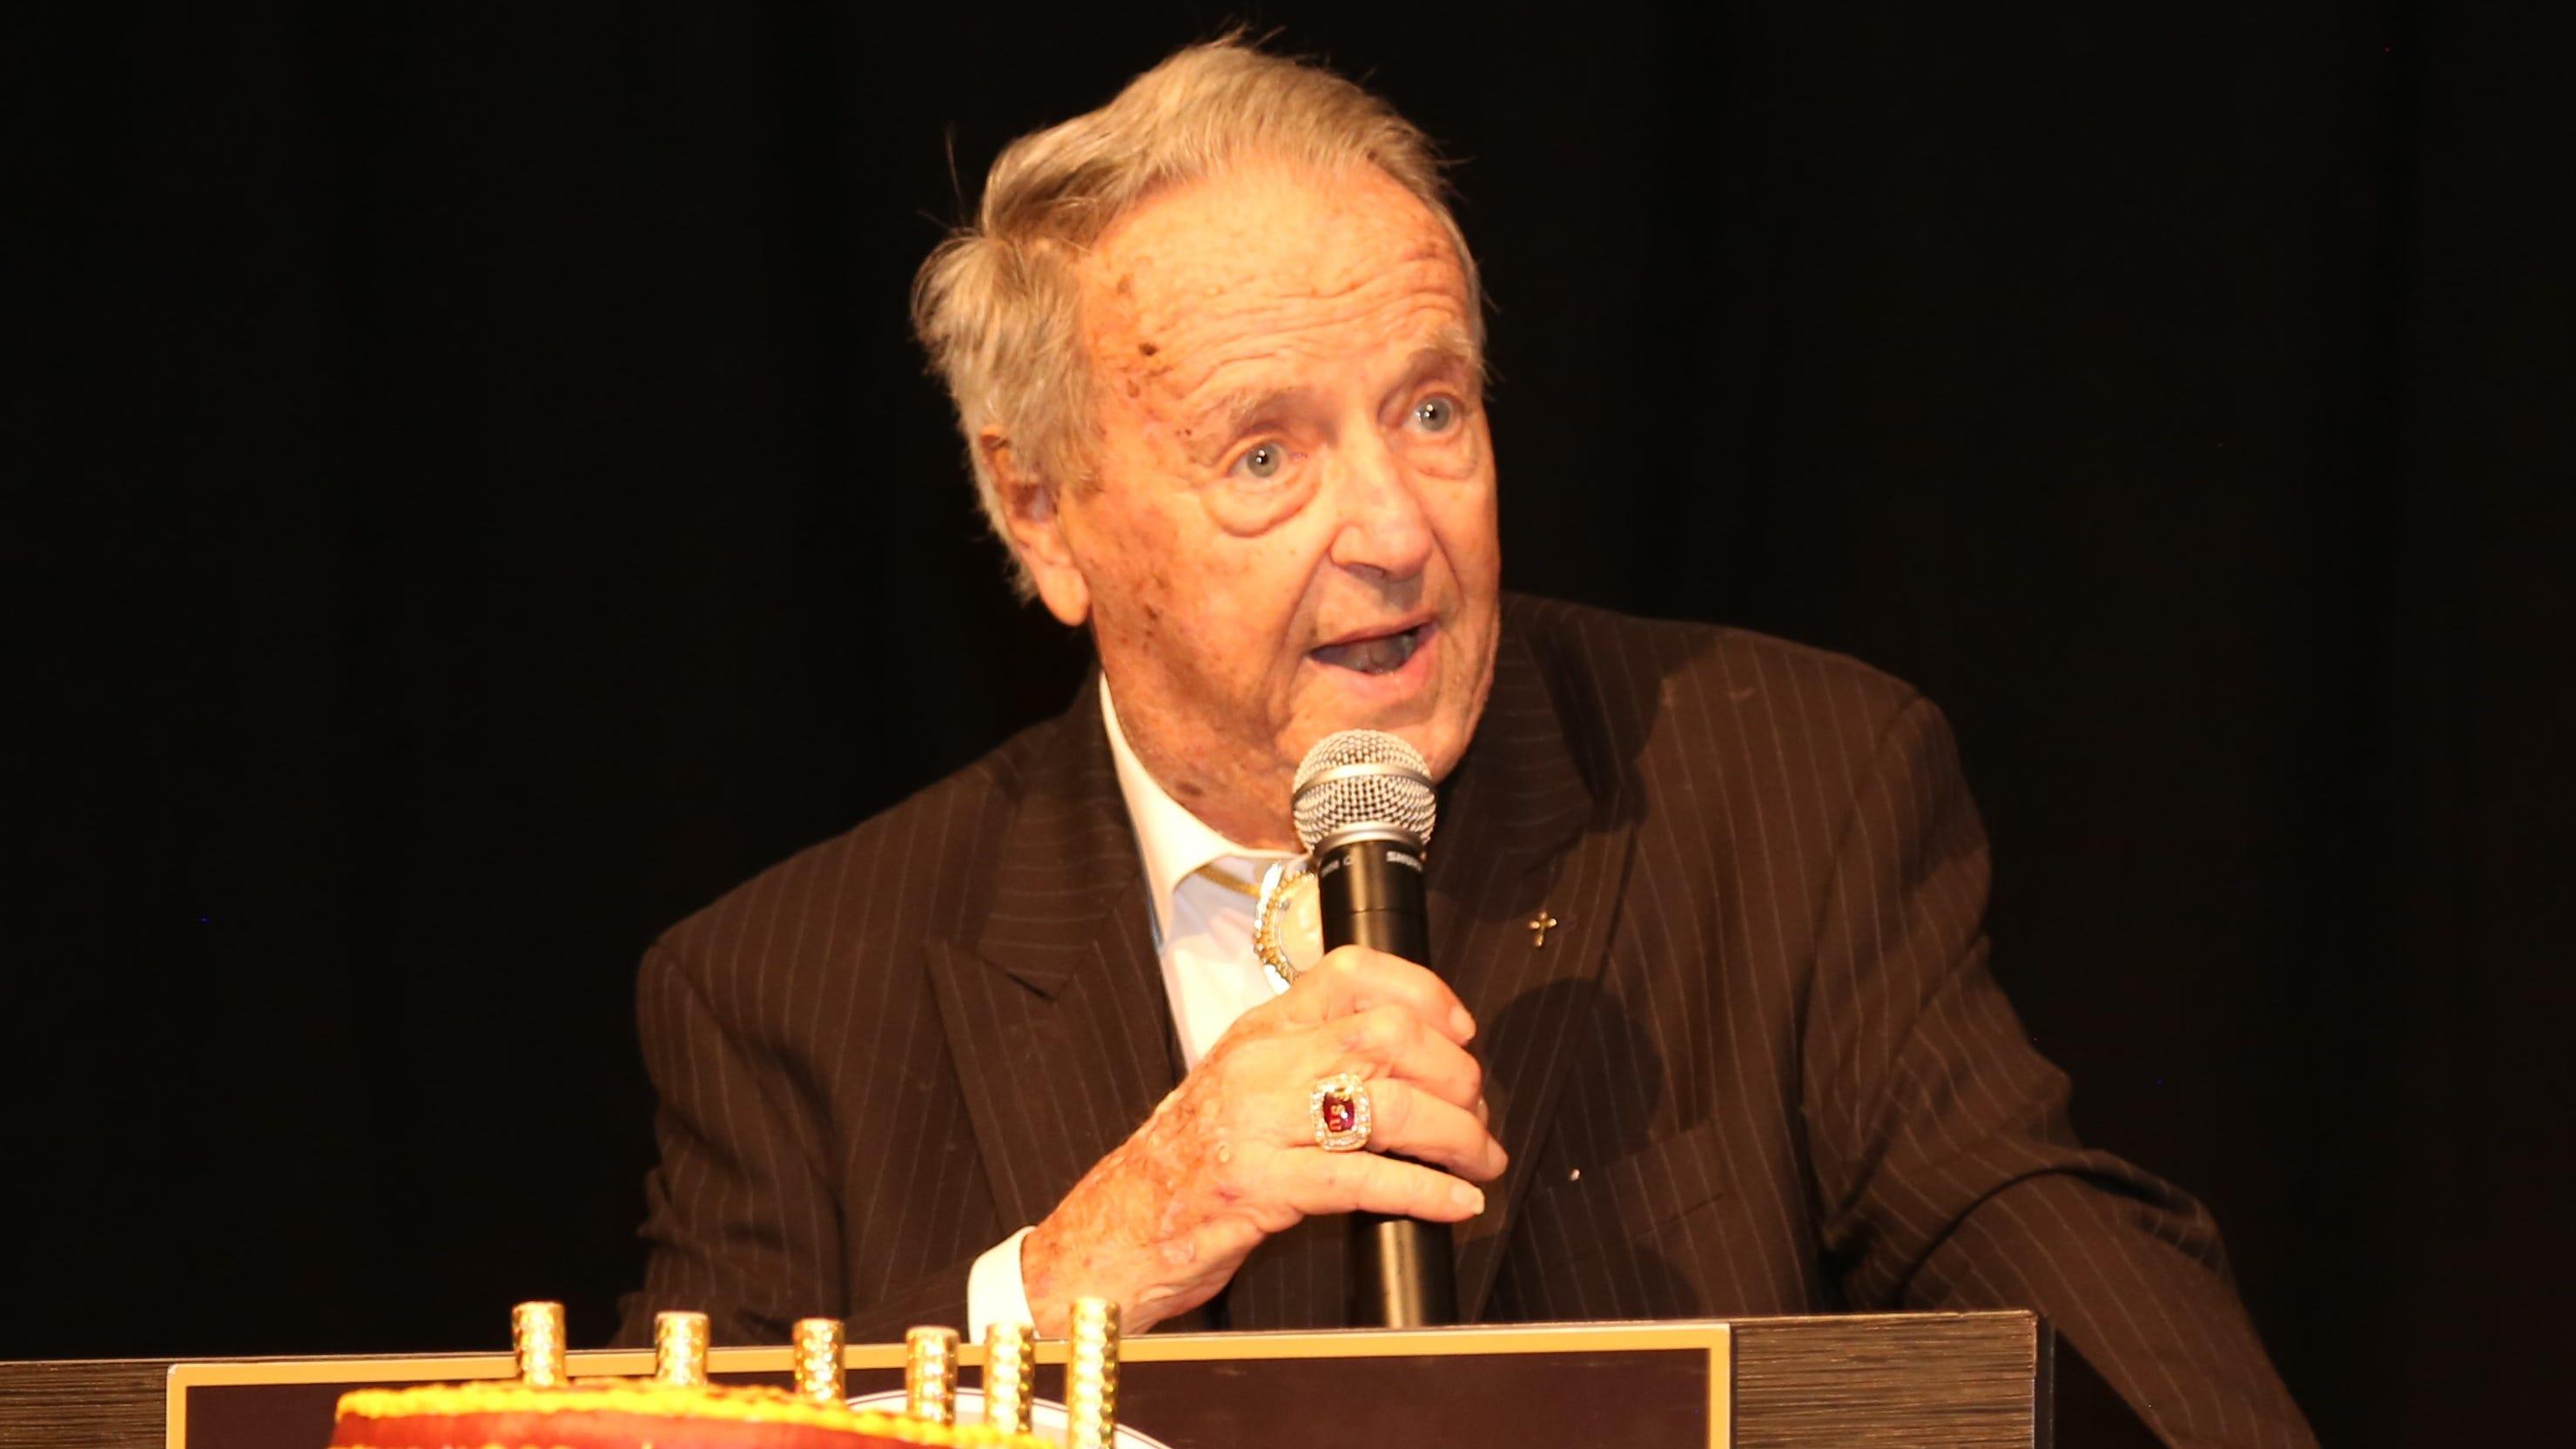 Bobby Bowden birthday: 90 dadgum years for legendary